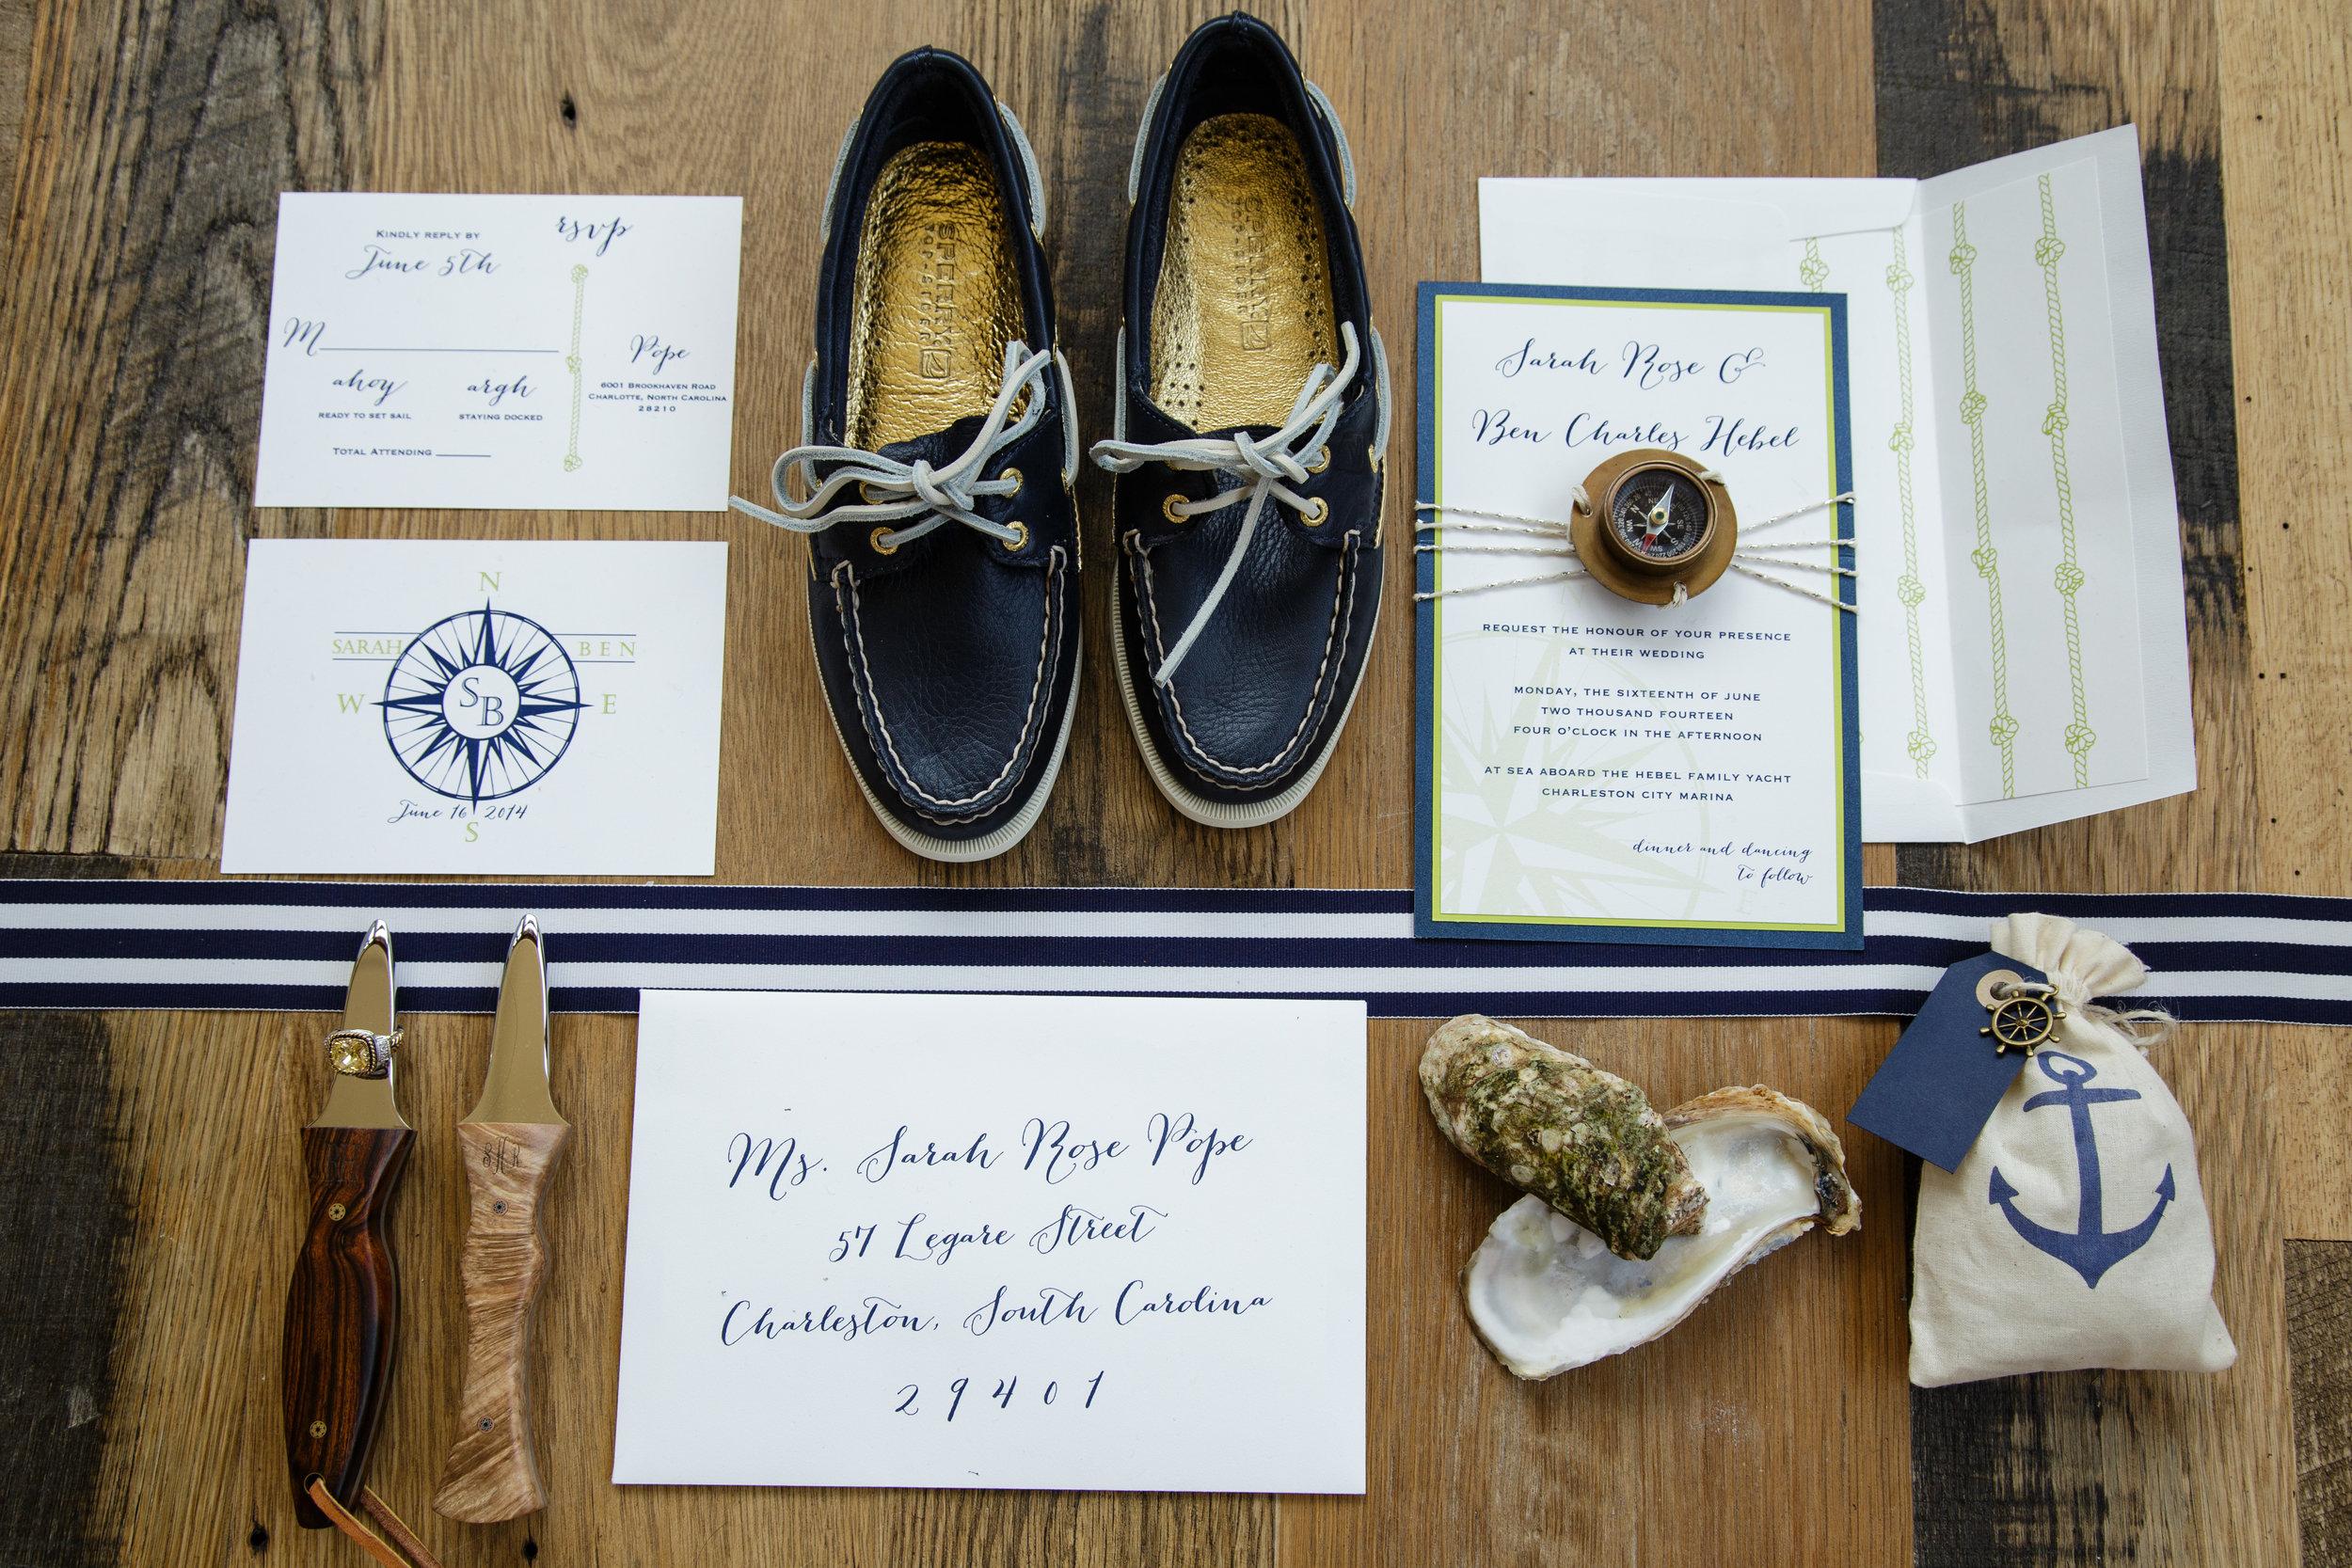 charleston wedding planners | nautical wedding groom's shoes, custom sperry boat shoes, nautical boutonnierre, nautical bowtie